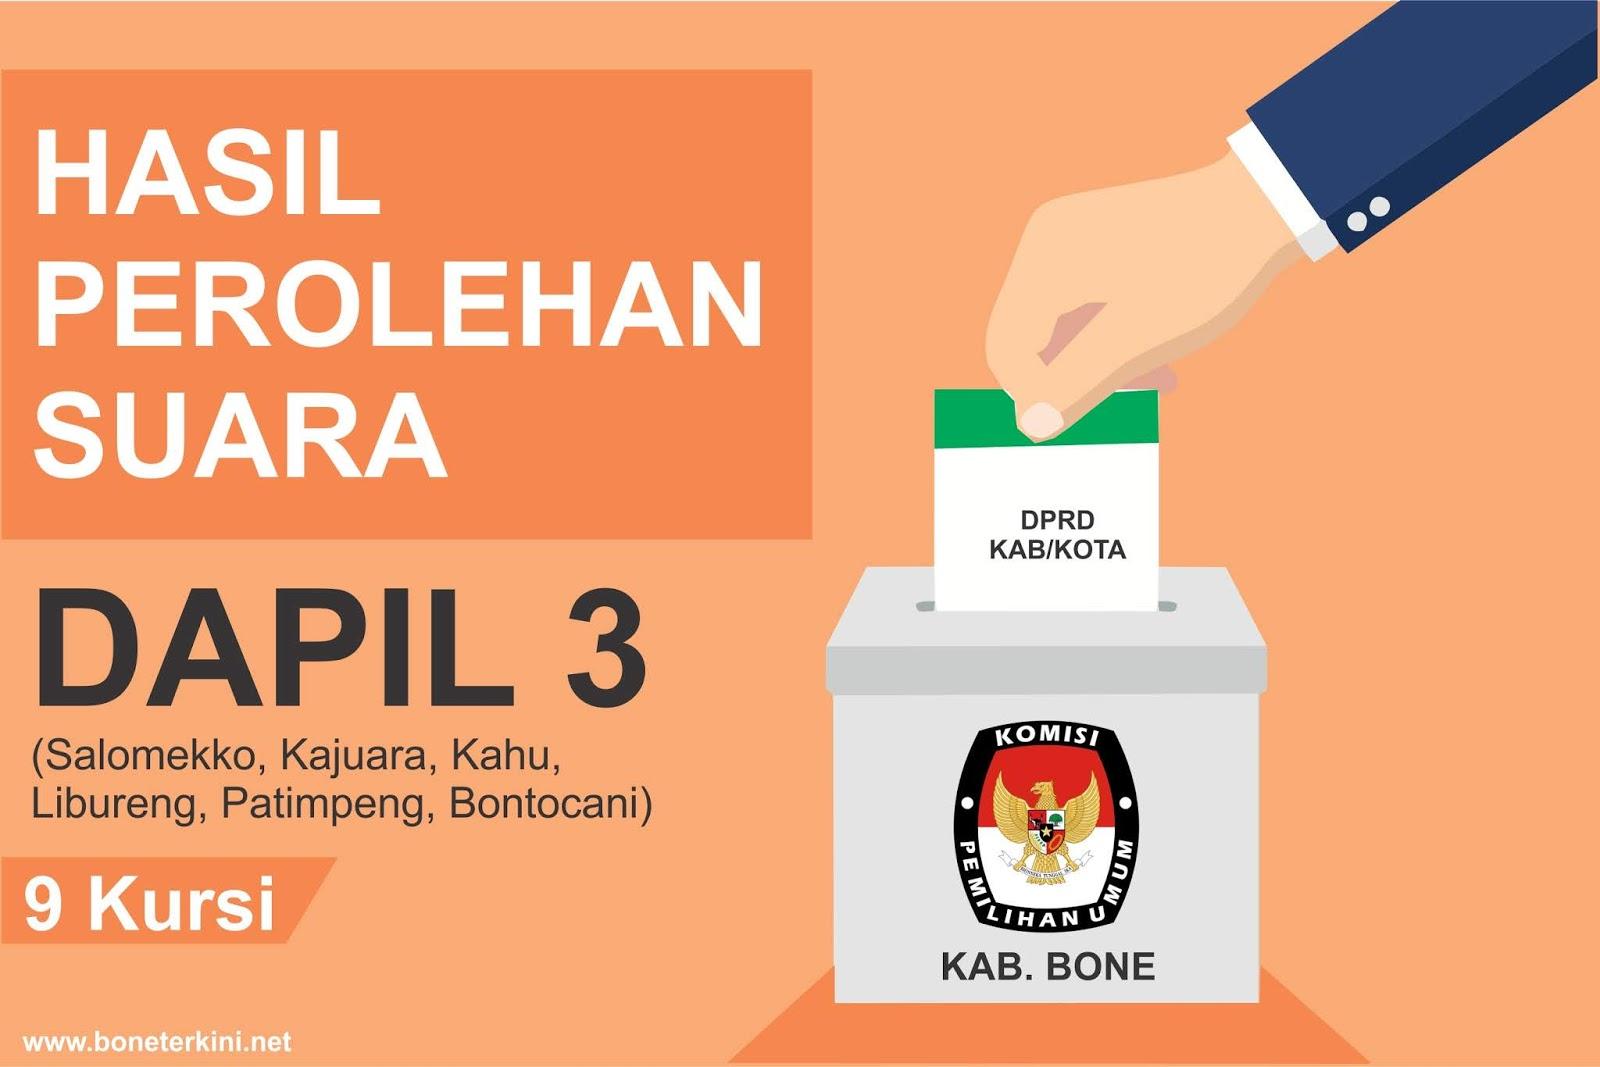 Ini Caleg Terpilih DPRD Kabupaten Bone Dapil 3 Hasil Rekapitulasi KPU